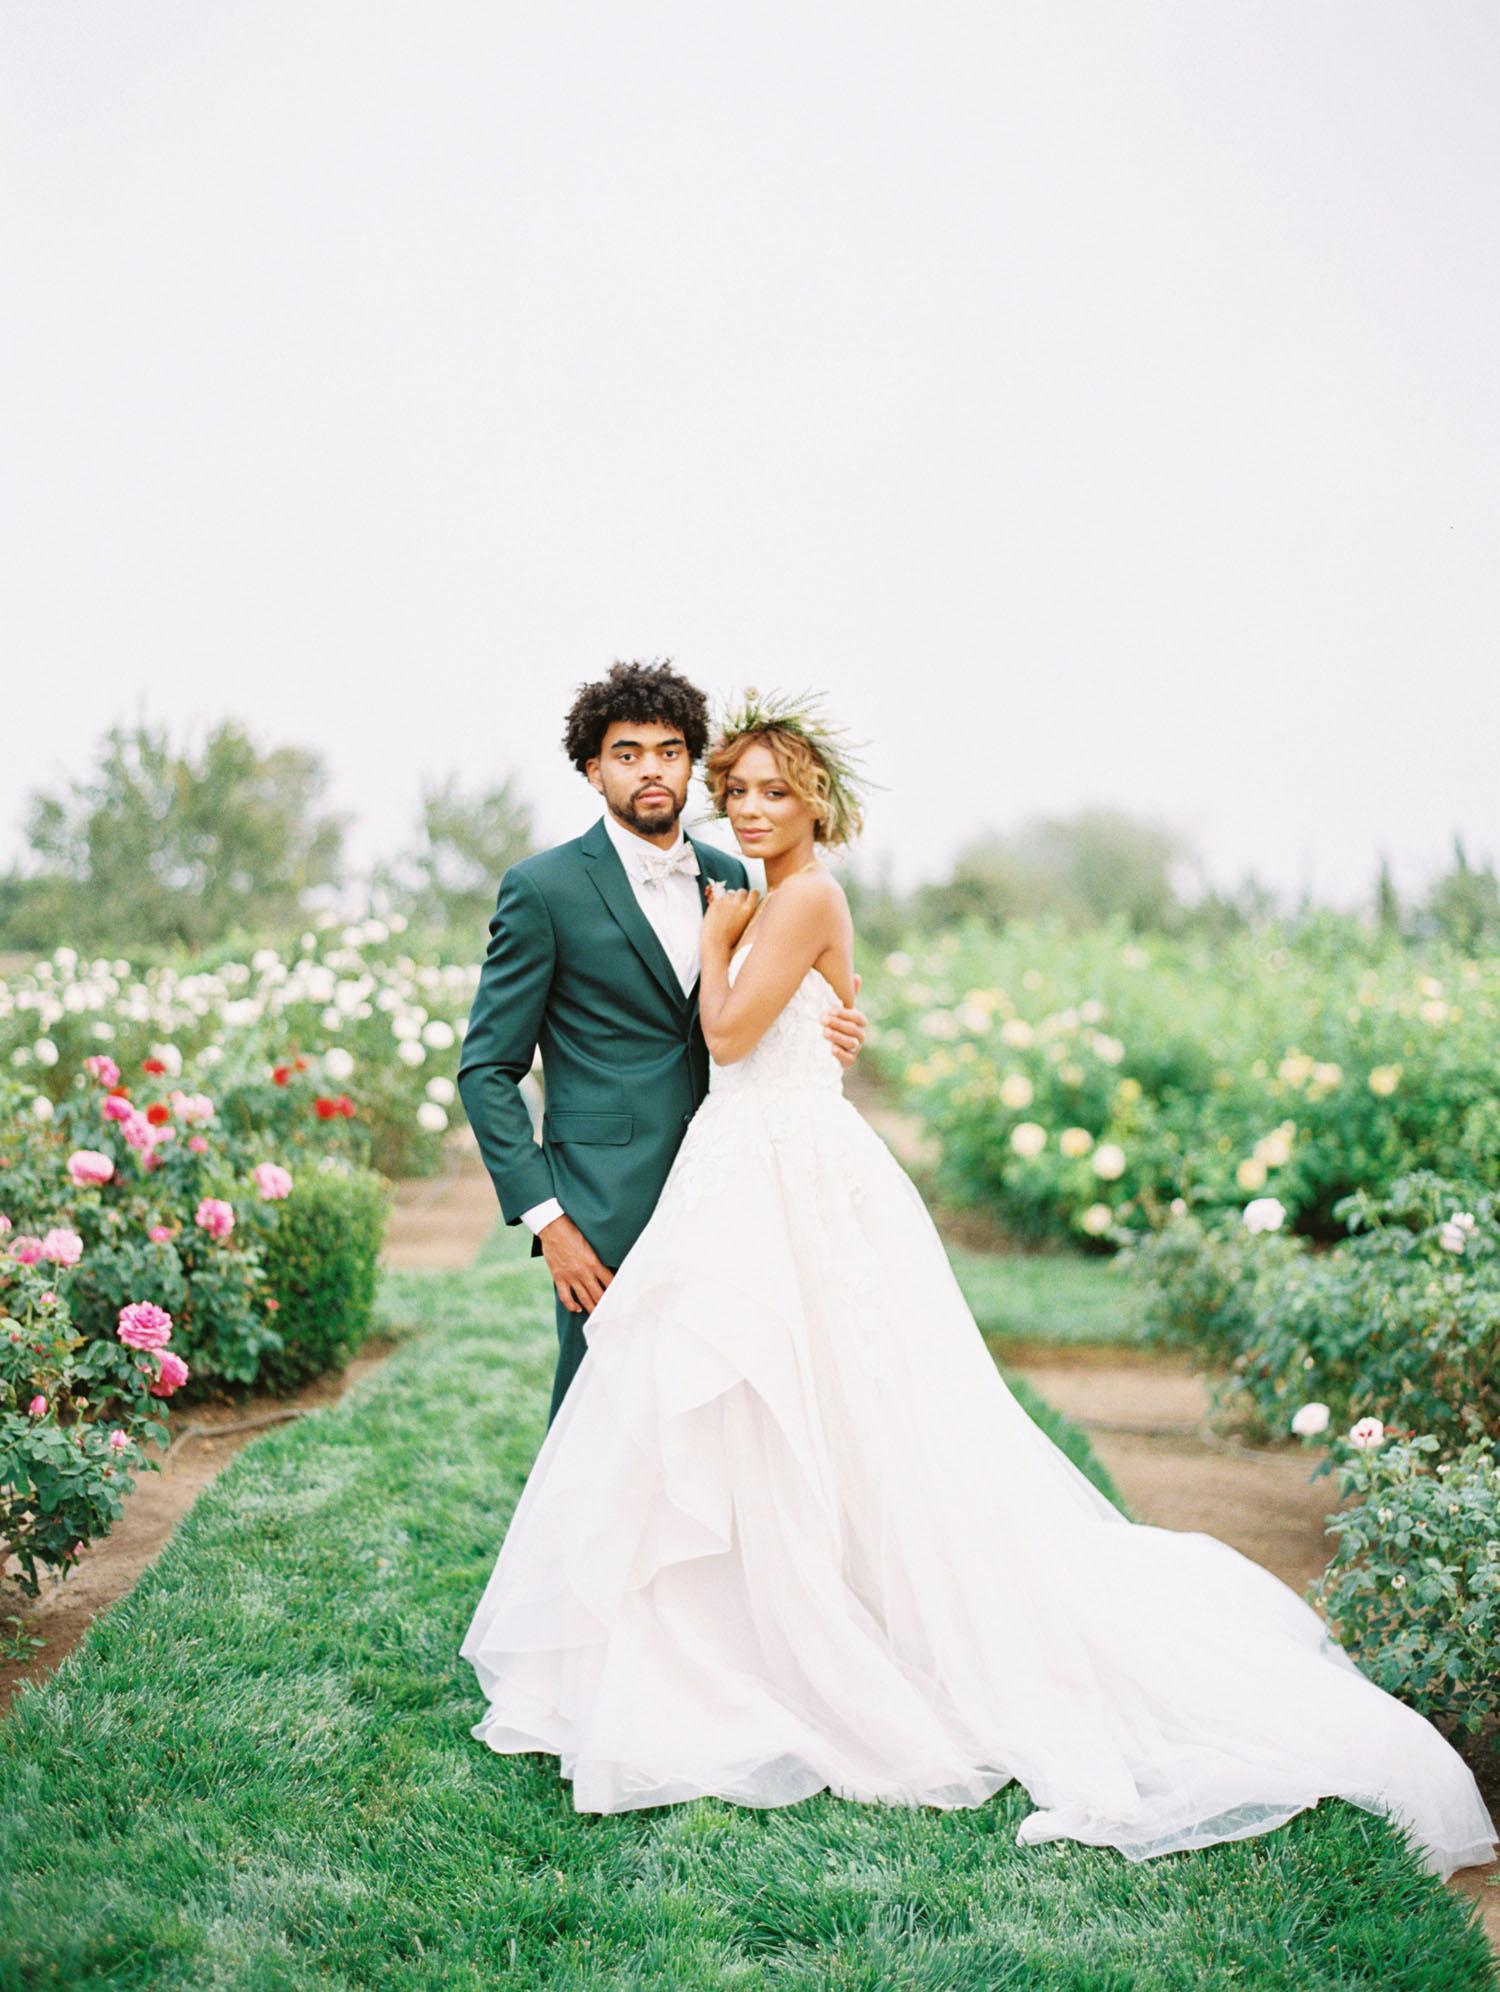 Intimate Greenhouse Garden Wedding Inspiration